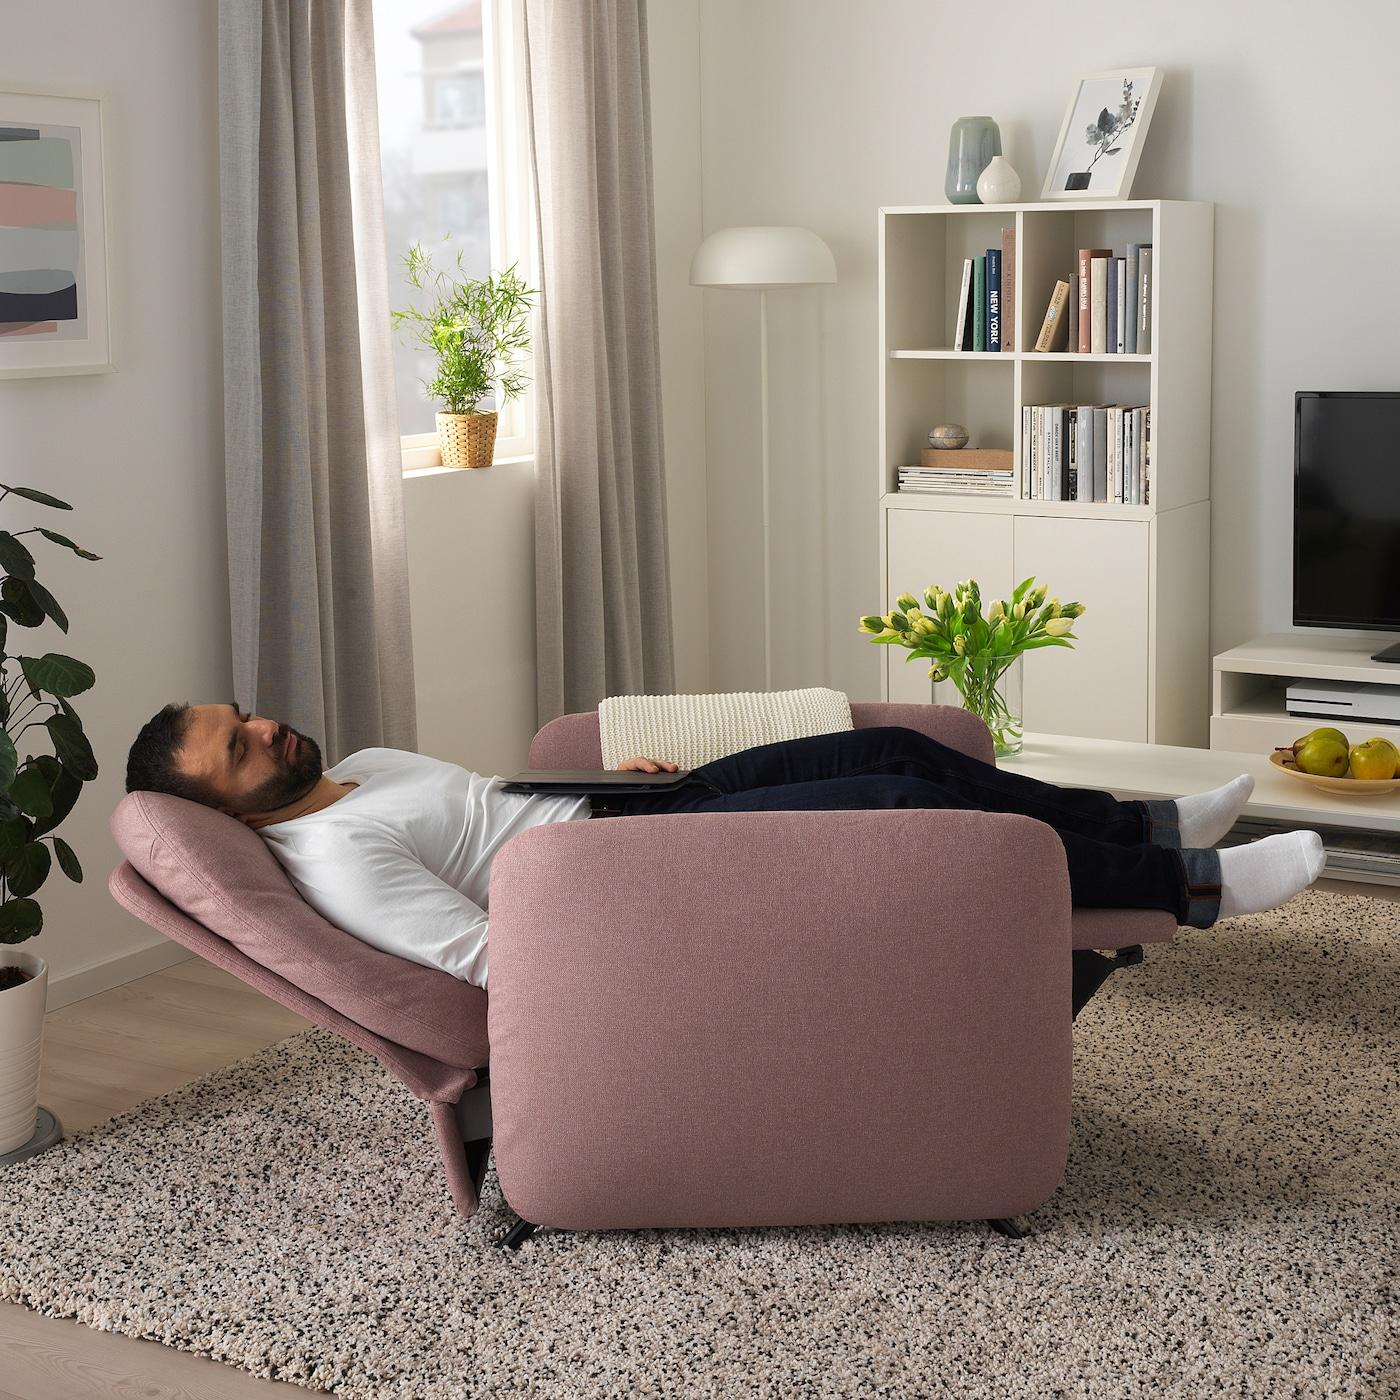 Ekolsund Fauteuil Confort - Gunnared Brun-Rose Clair concernant Fauteuil Relax Électrique Ikea